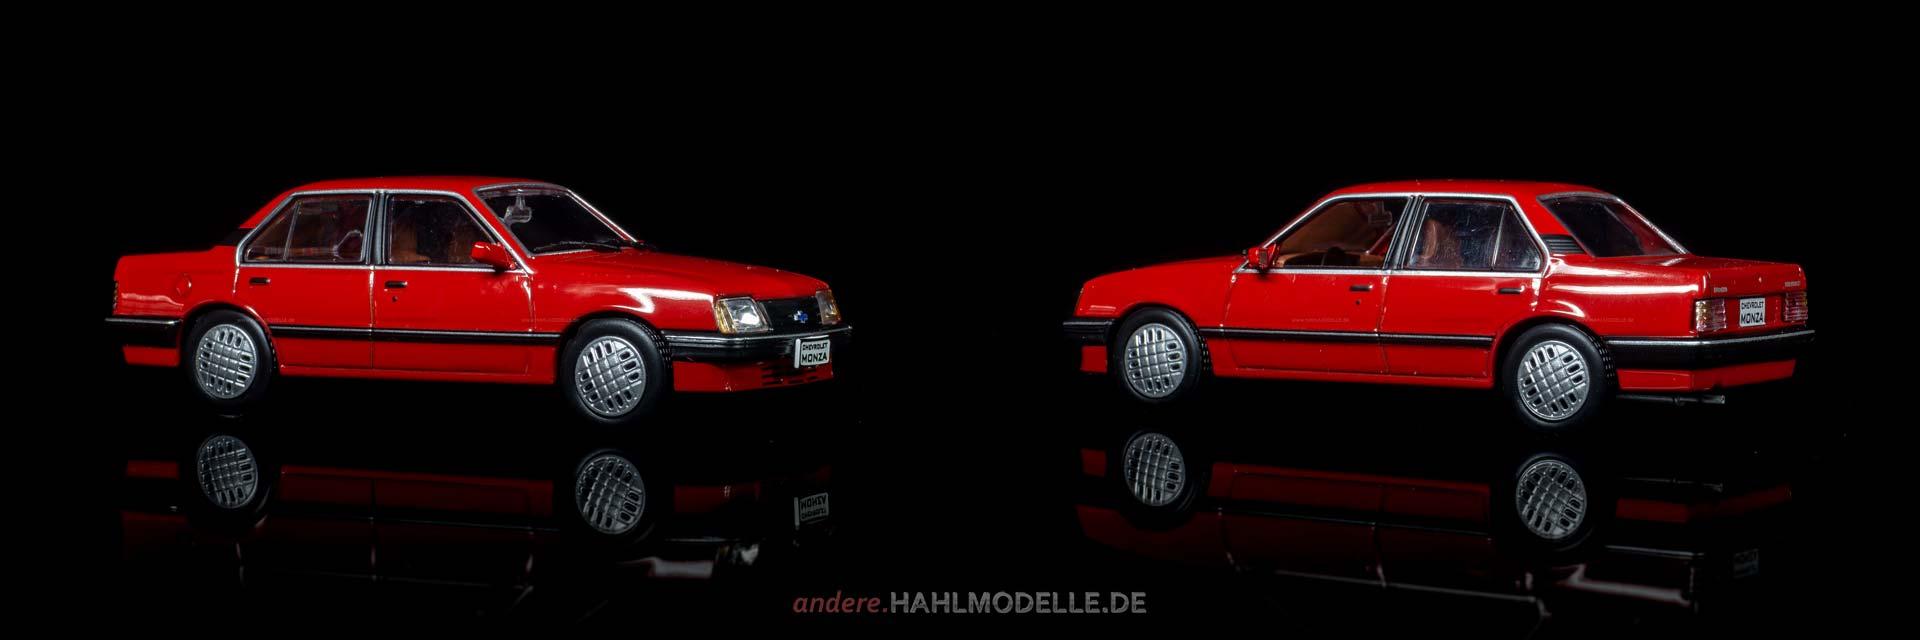 Chevrolet Monza | Limousine | Ixo (Opel Collection von Eaglemoss) | 1:43 | www.andere.hahlmodelle.de